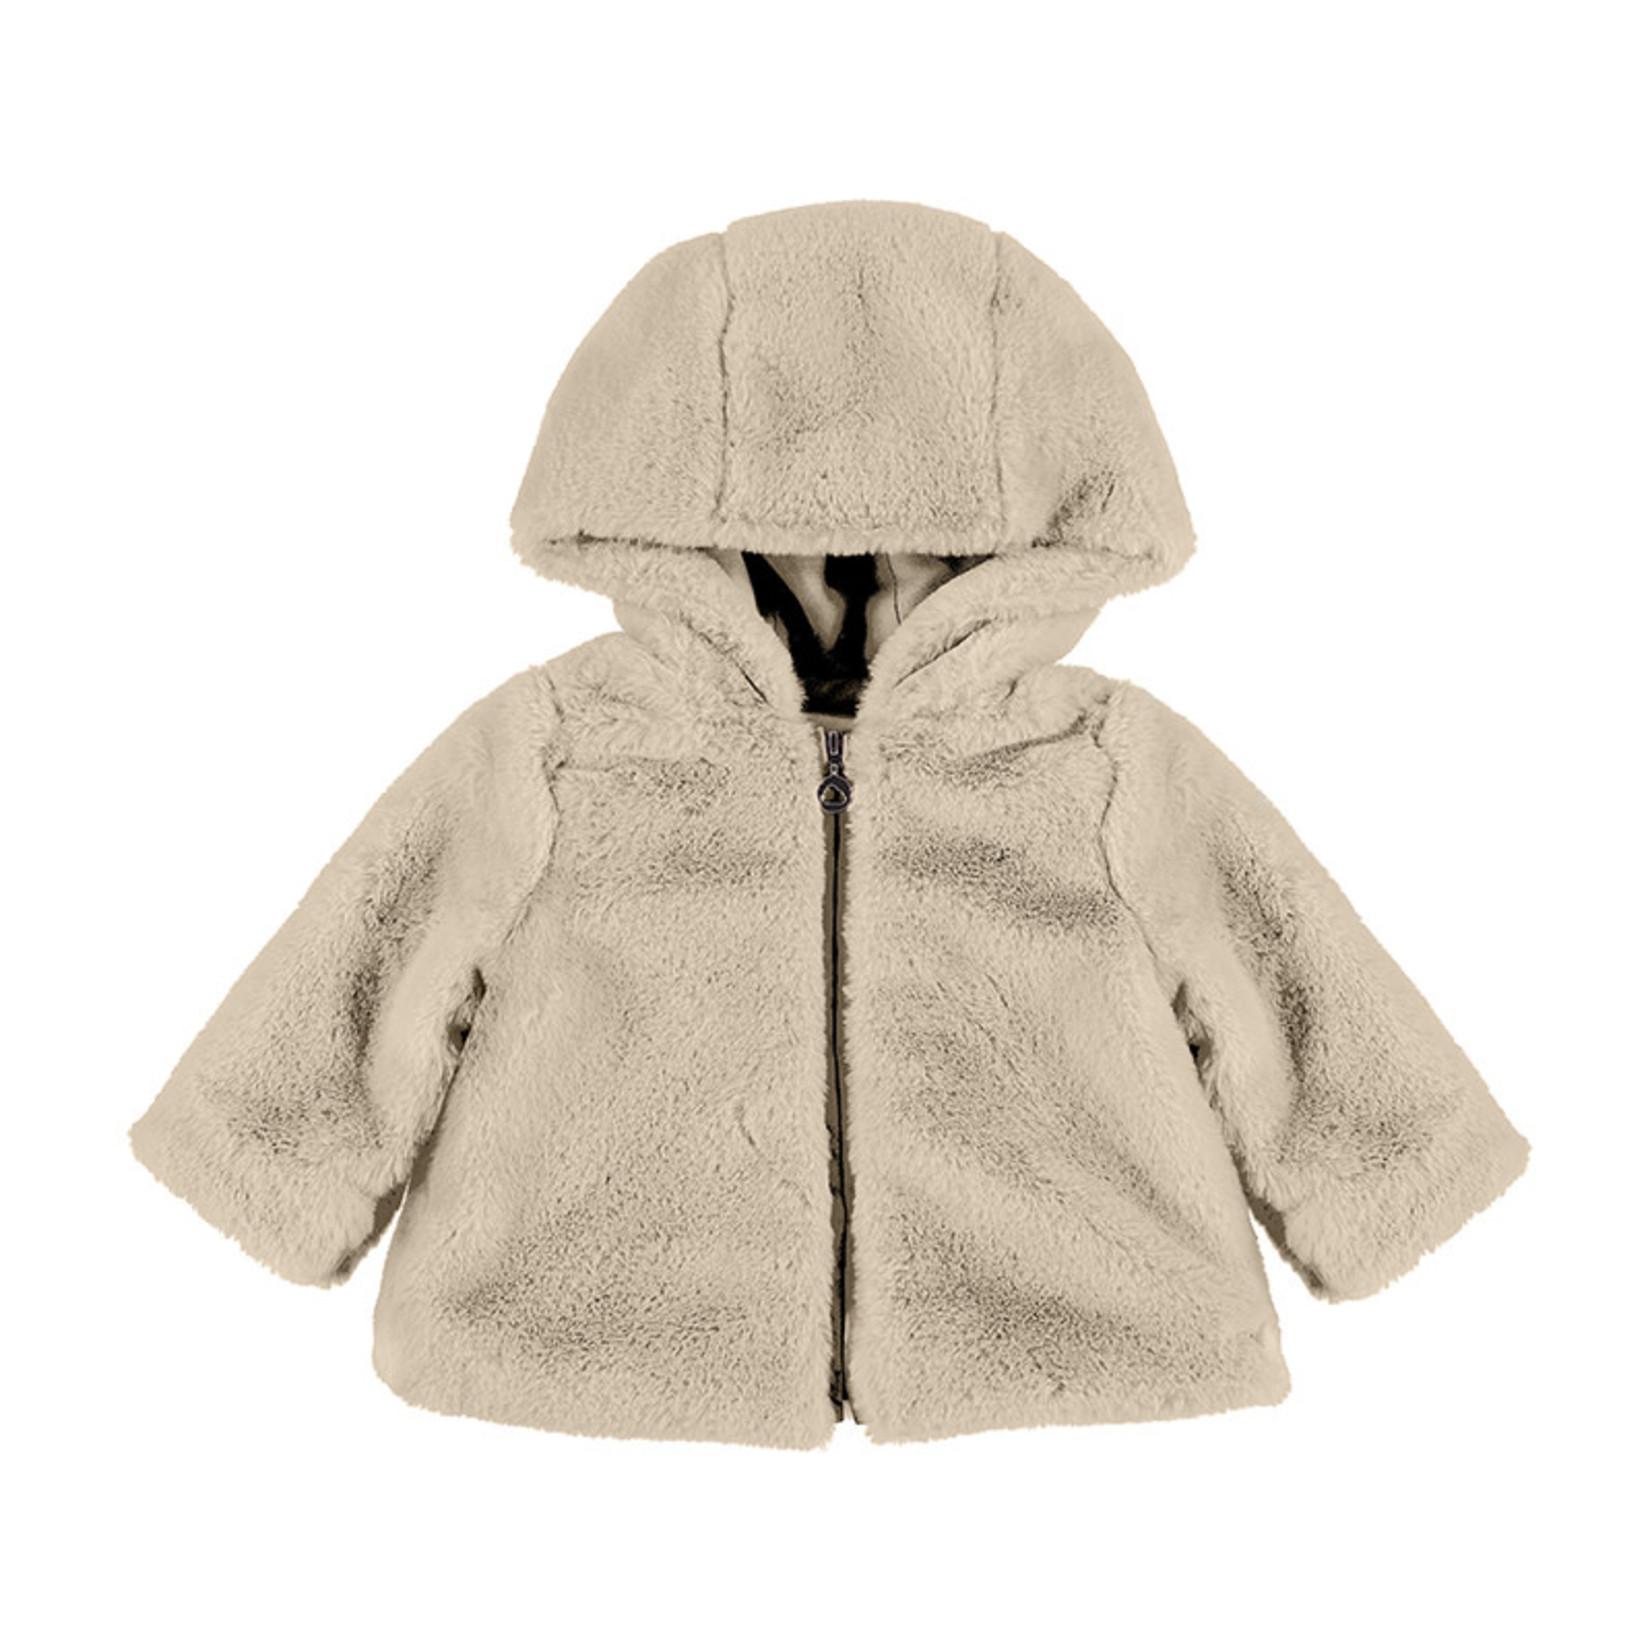 Mayoral Jacket Faux Fur - Mayoral